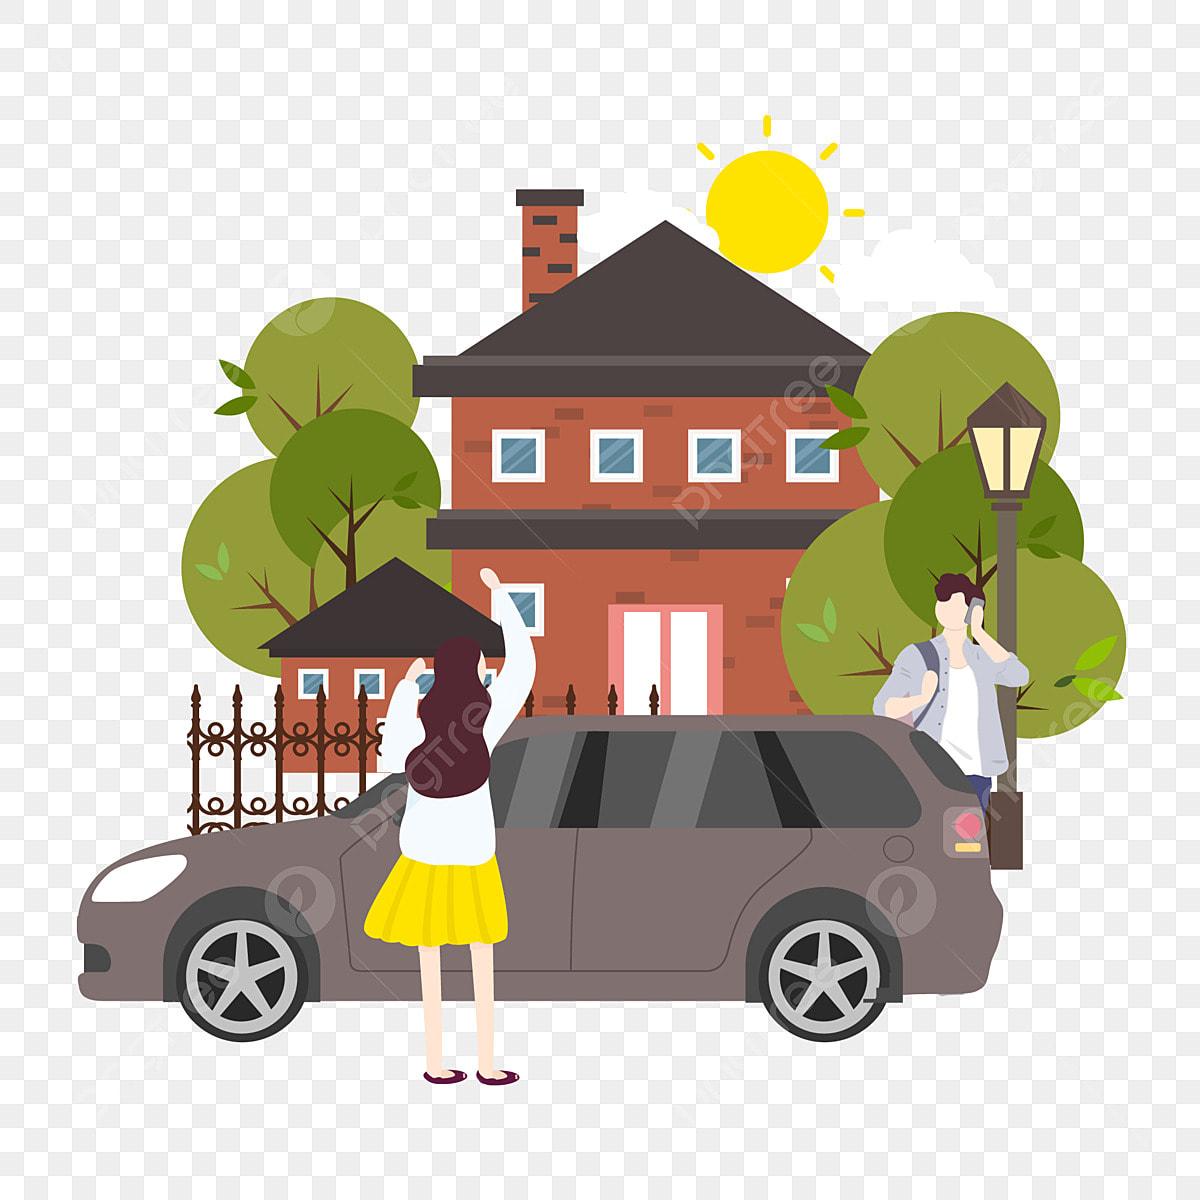 Gambar Lelaki Keluar Dari Vila Orang Orang Muda Memanggil Gadis Memanggil Memanggil Mobil Mobil Rumah Bangunan Png Dan Vektor Dengan Latar Belakang Transparan Untuk Unduh Gratis